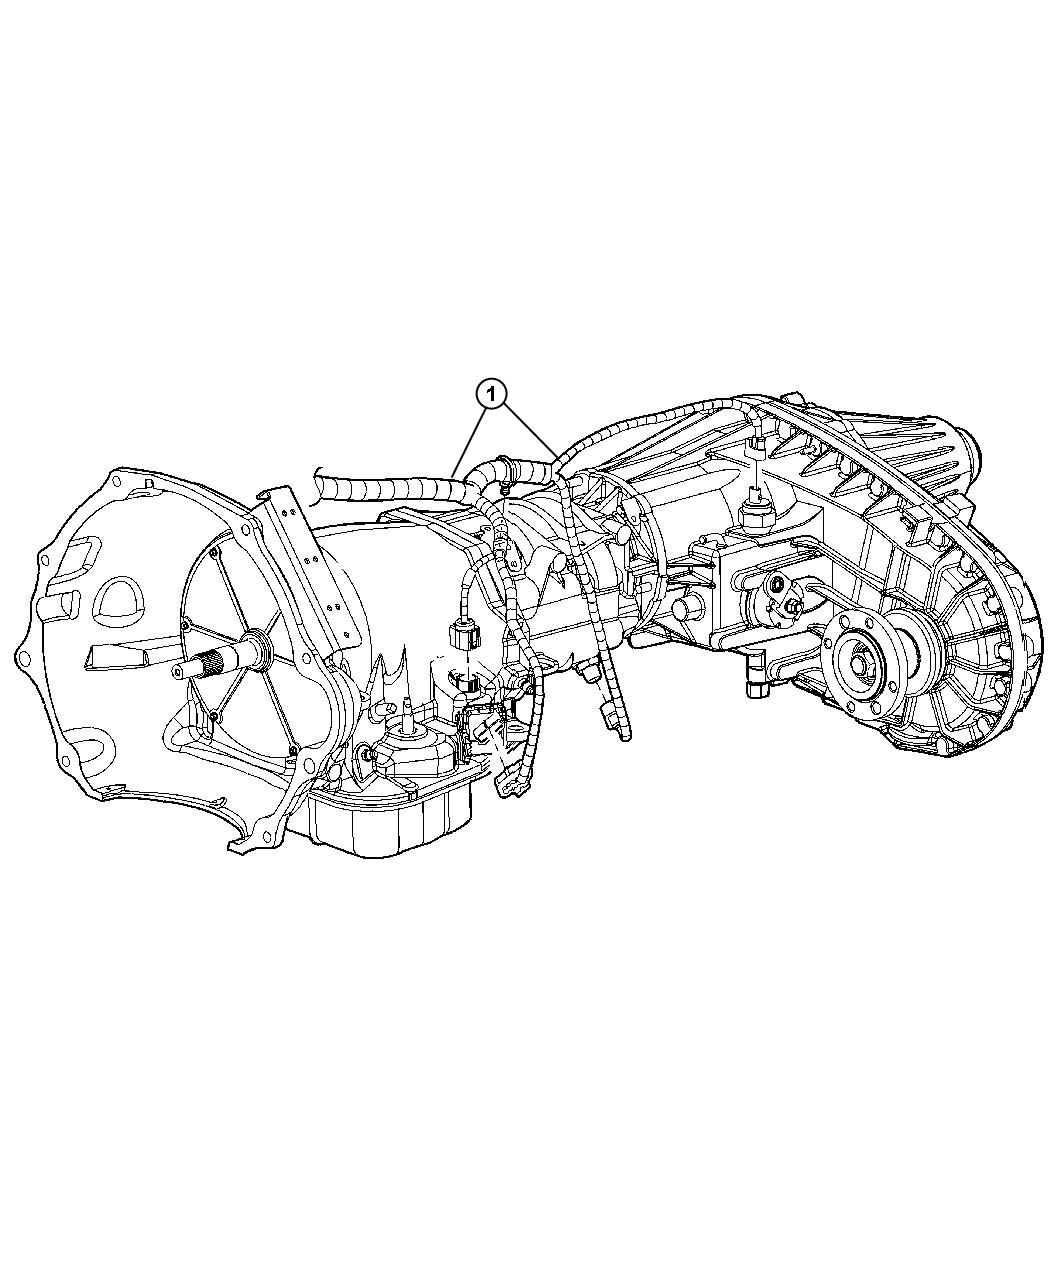 2012 Dodge Ram 1500 Wiring  Transmission  Case  Transfer